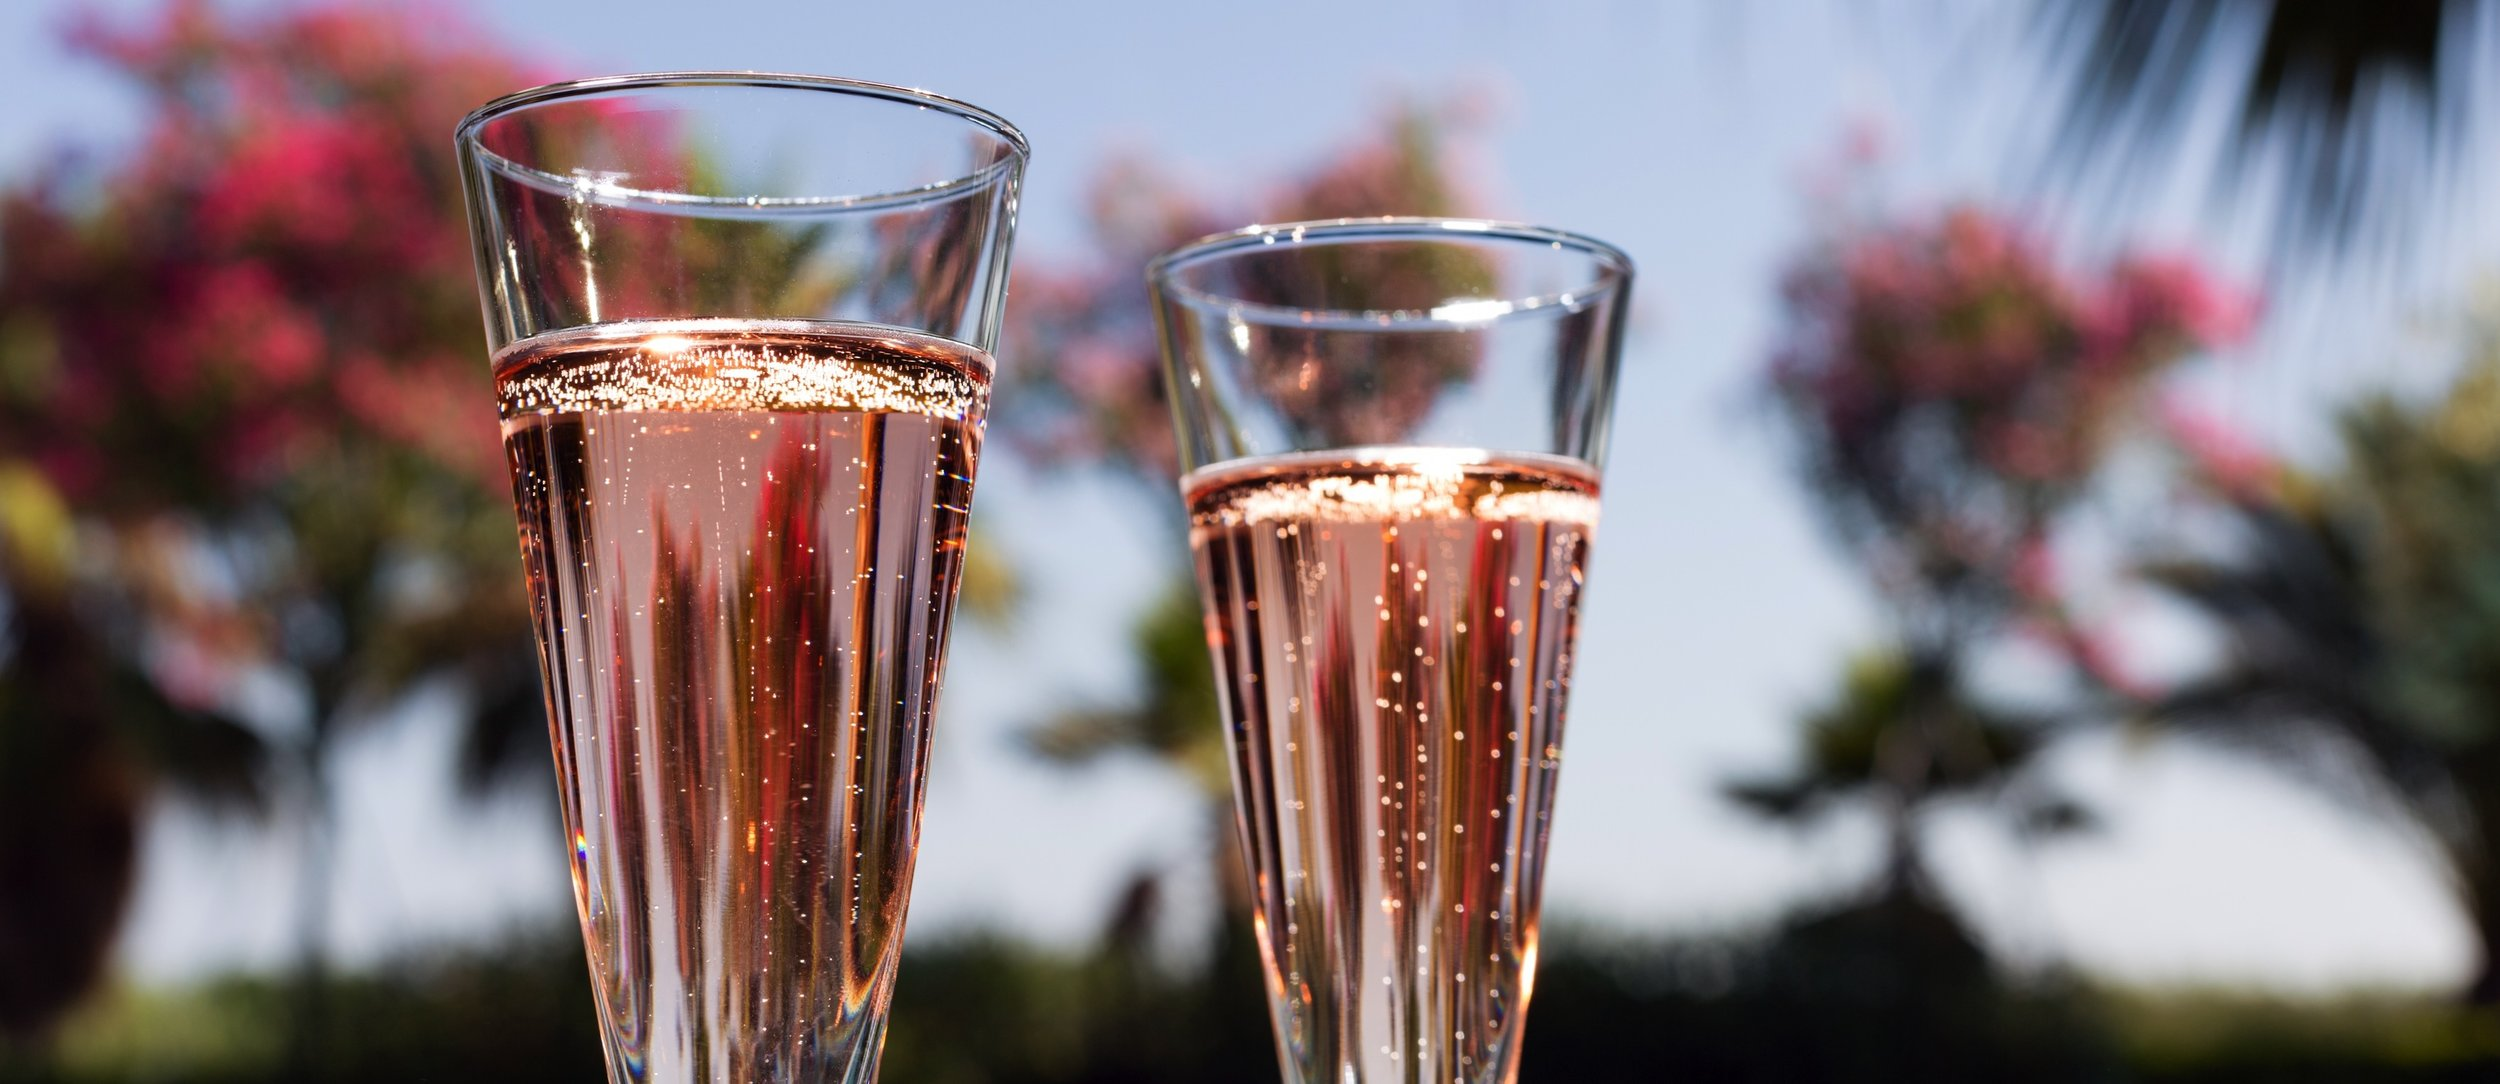 bigstock-Two-Glasses-Of-Champagne-75791773.jpg